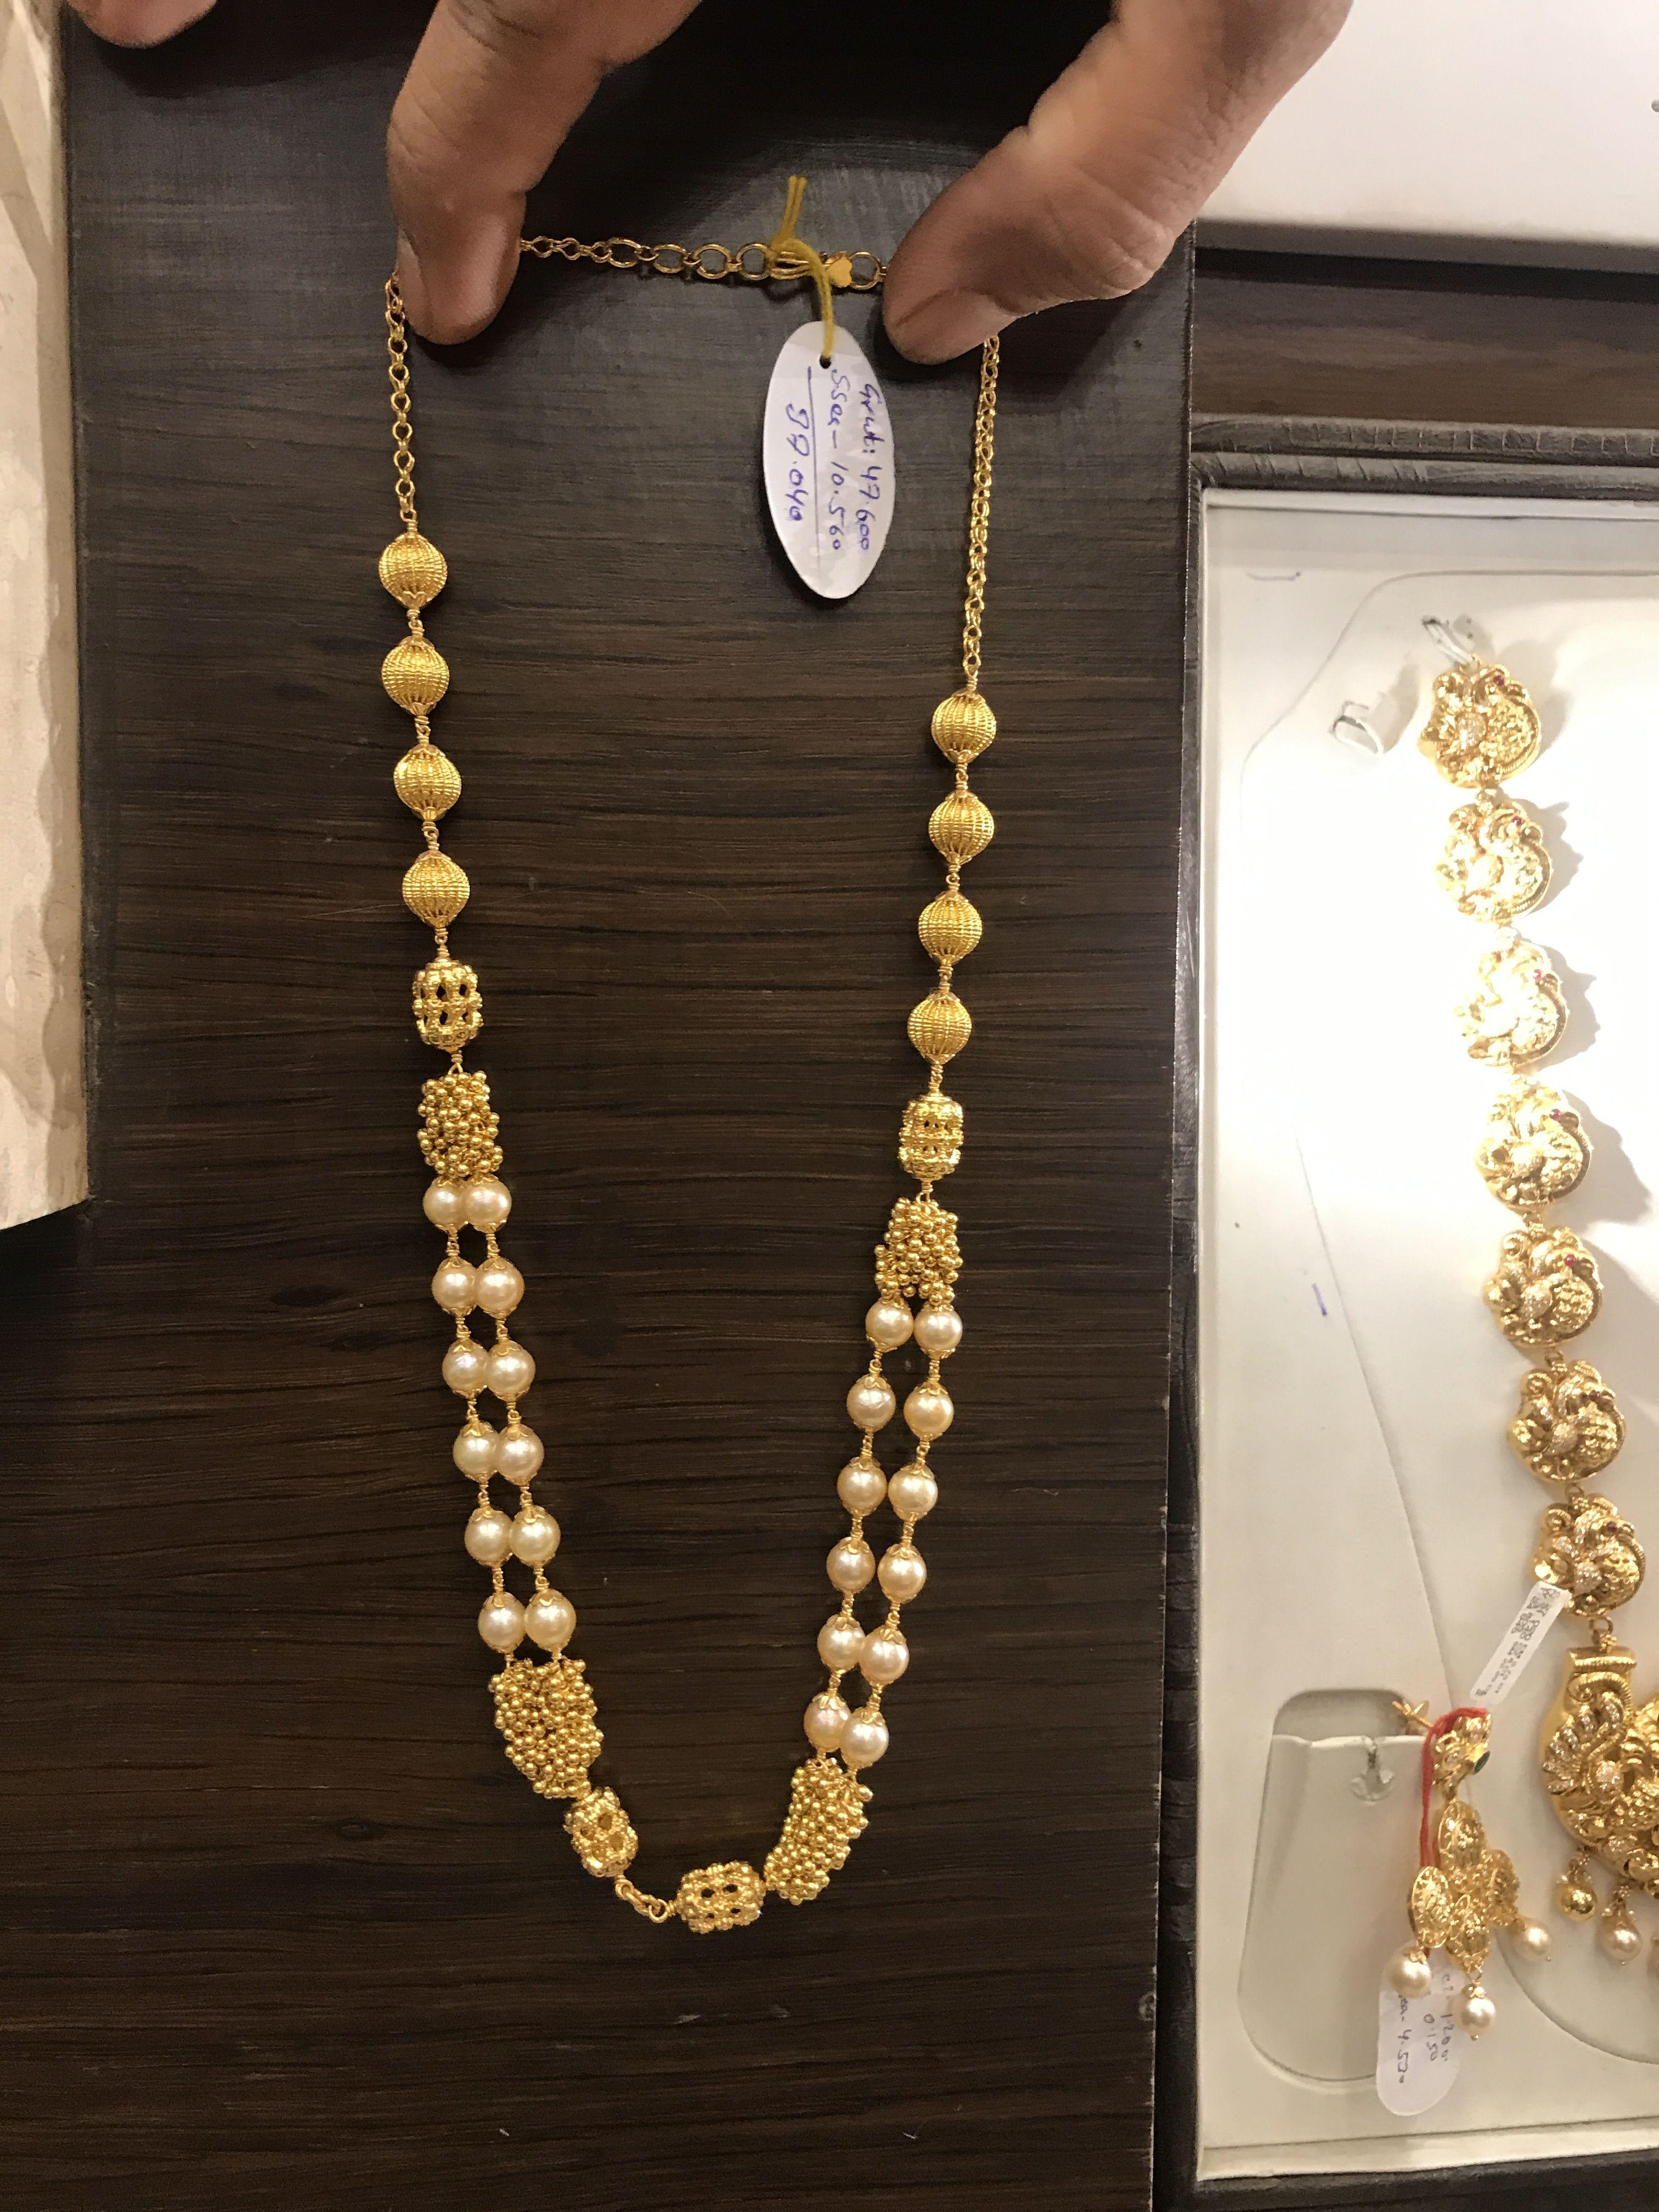 Pin by srilatha salla on jewellery in pinterest jewelry